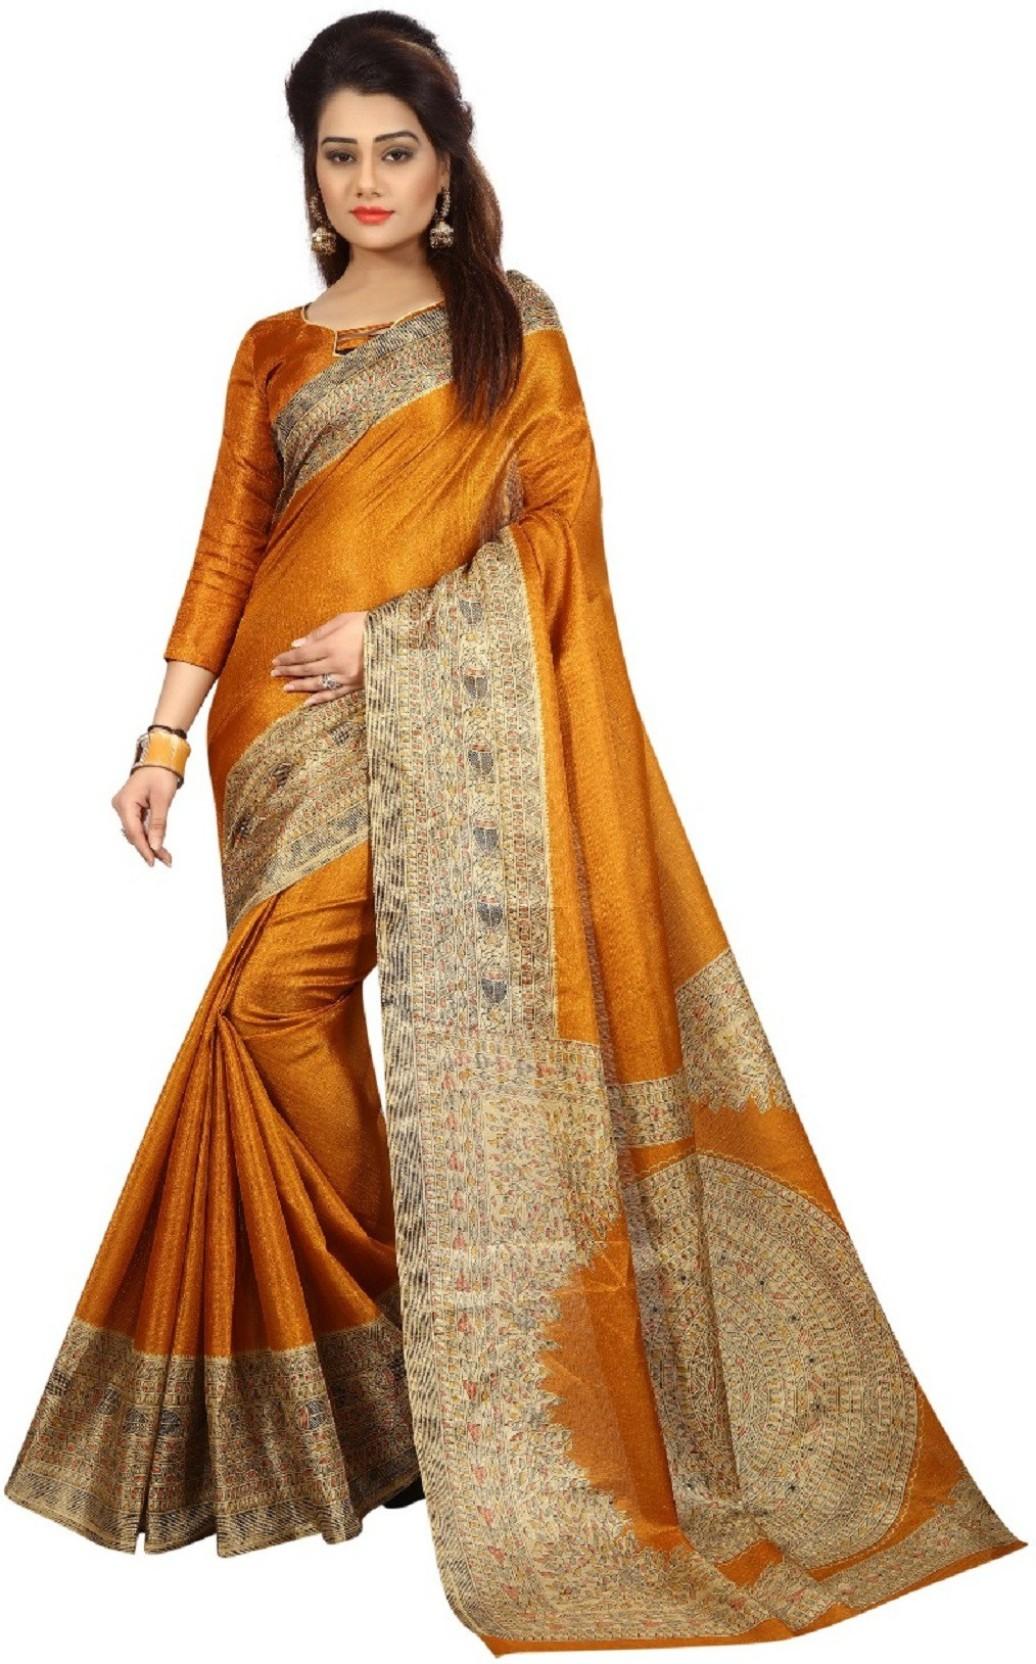 299d43fec04 Buy Arth Creation Printed Bhagalpuri Silk Yellow Sarees Online ...